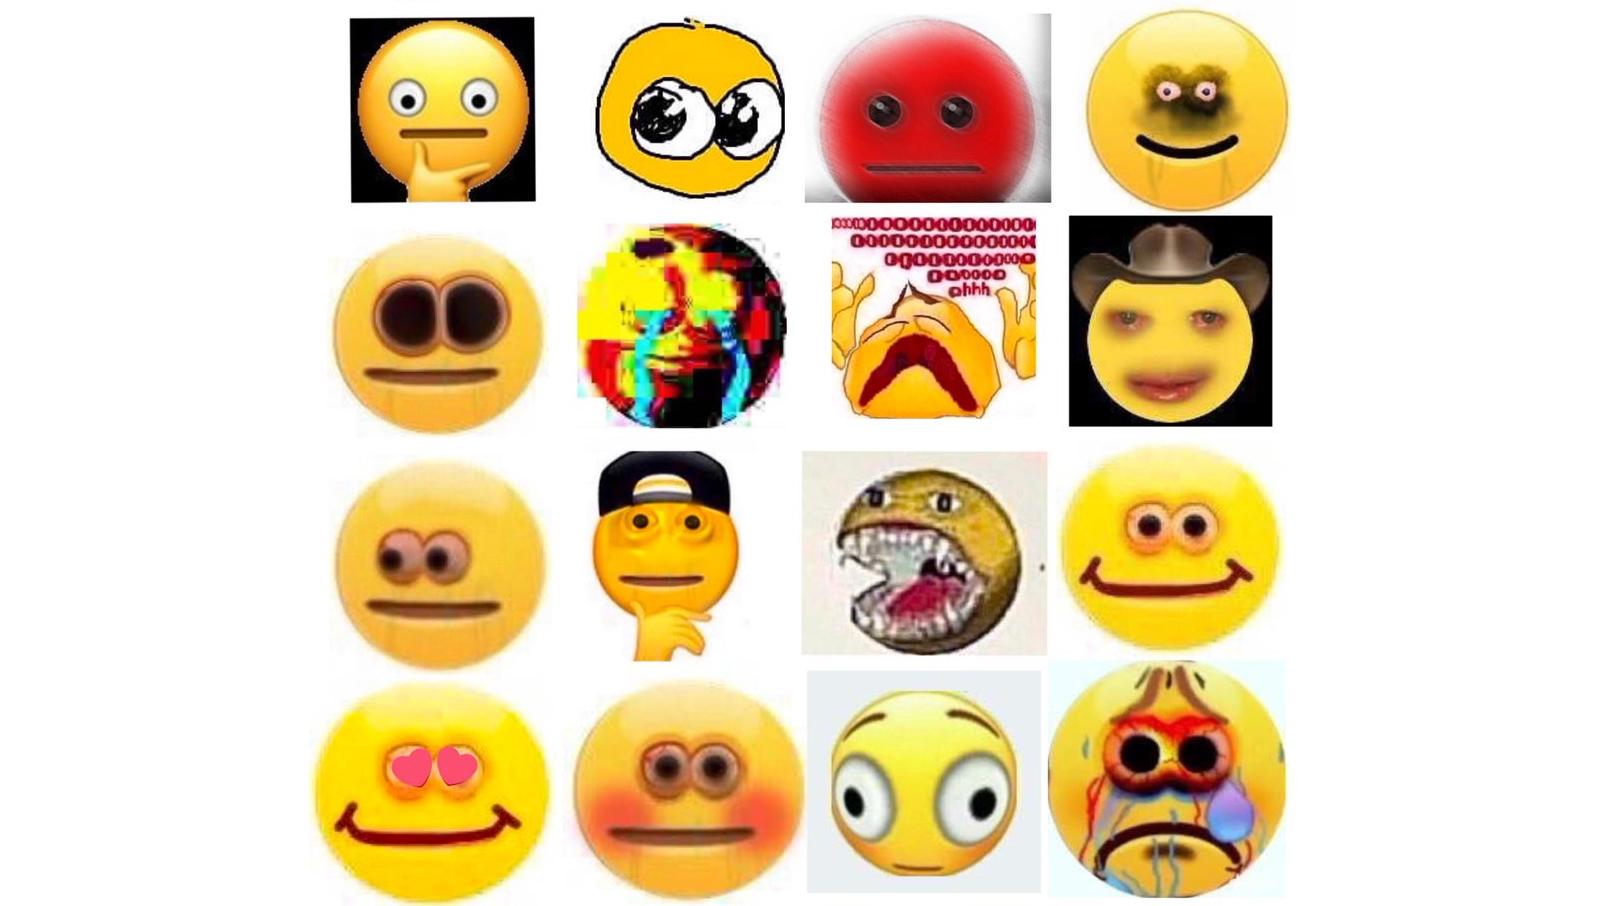 Oof Thumb Emojis For Discord Meme Png Image Transparent